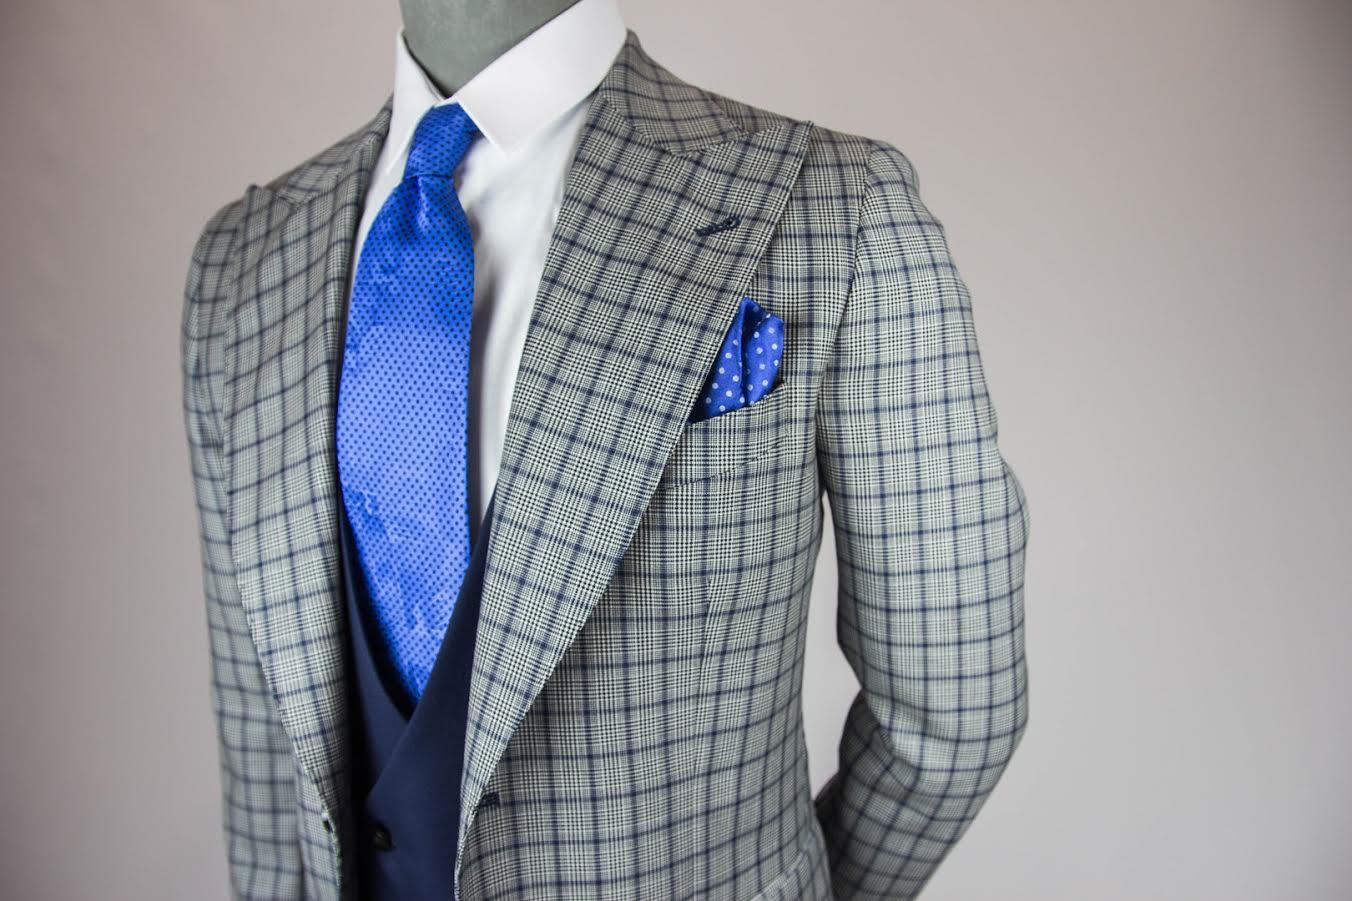 Matrimonio Informale Uomo : Vestiti uomo shabby chic look informale gil moda